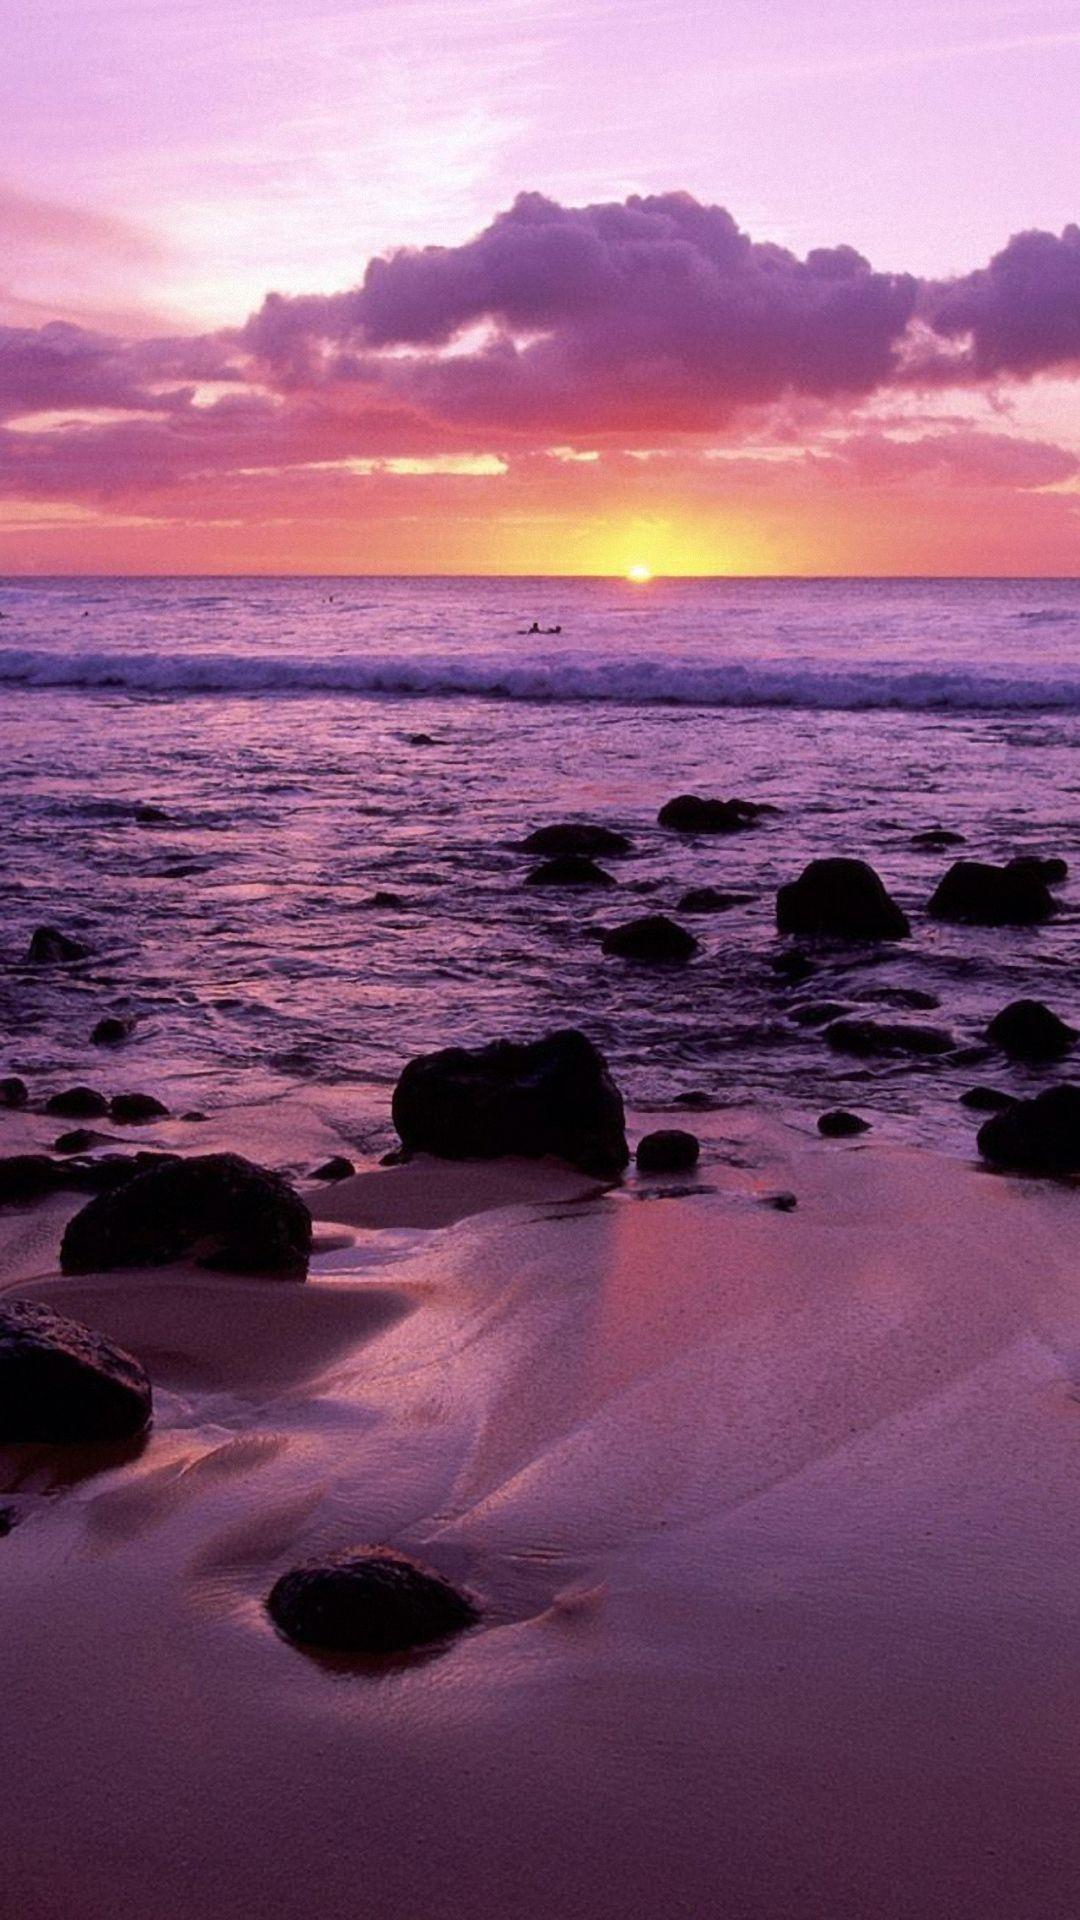 Hawaiian Sunset Wallpapers - Wallpaper Cave